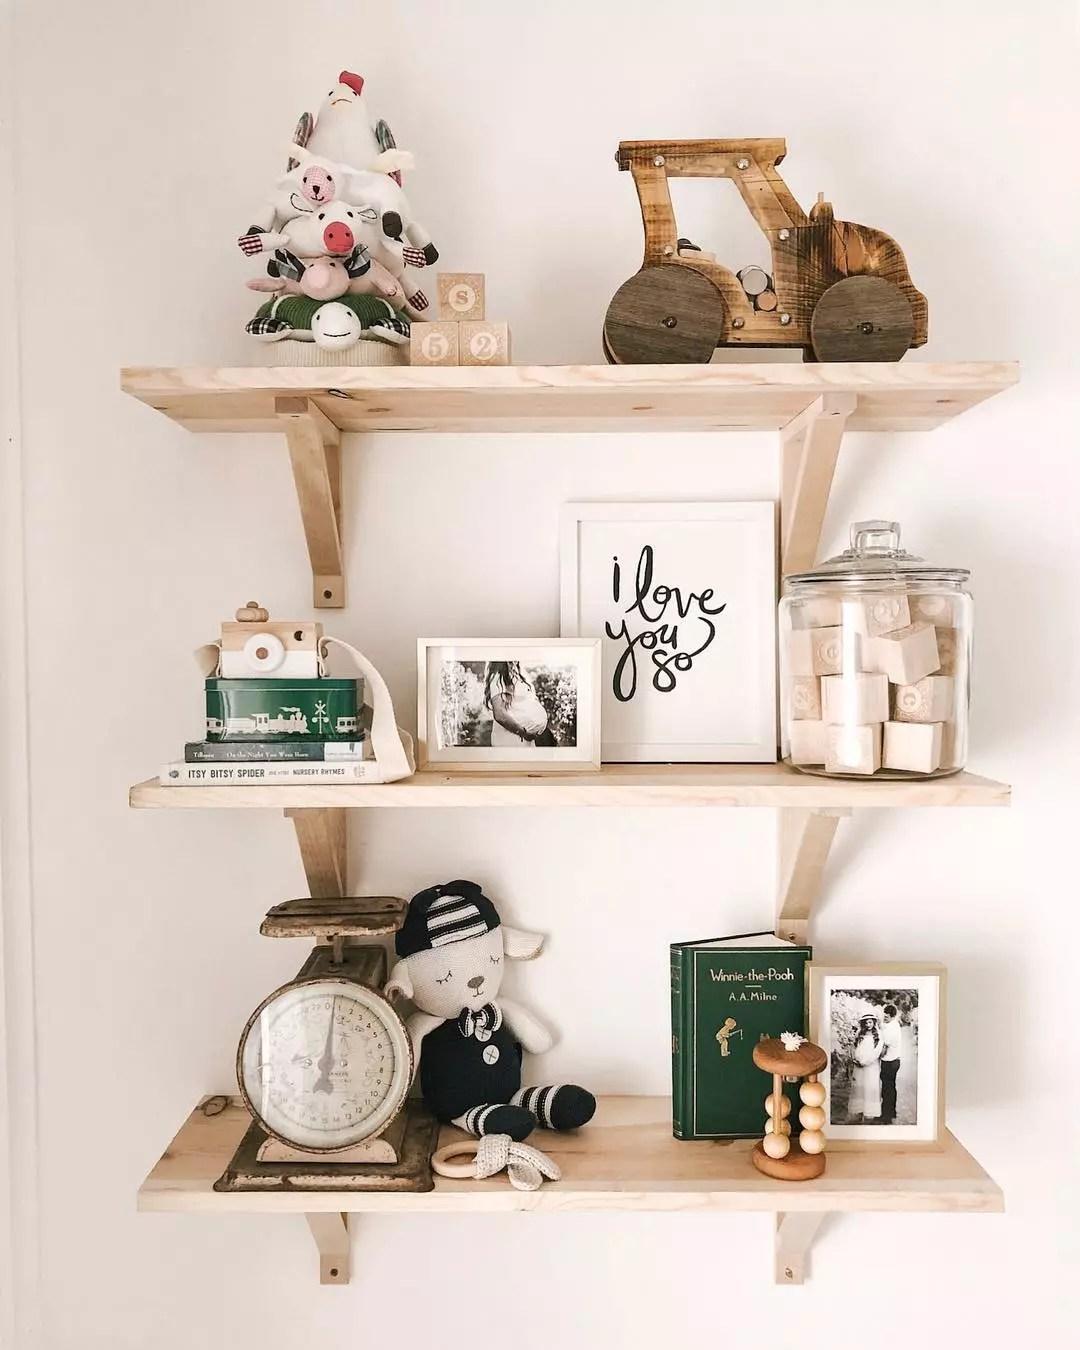 Floating shelves with baby decor. Photo by Instagram user @creativityinthecornbelt